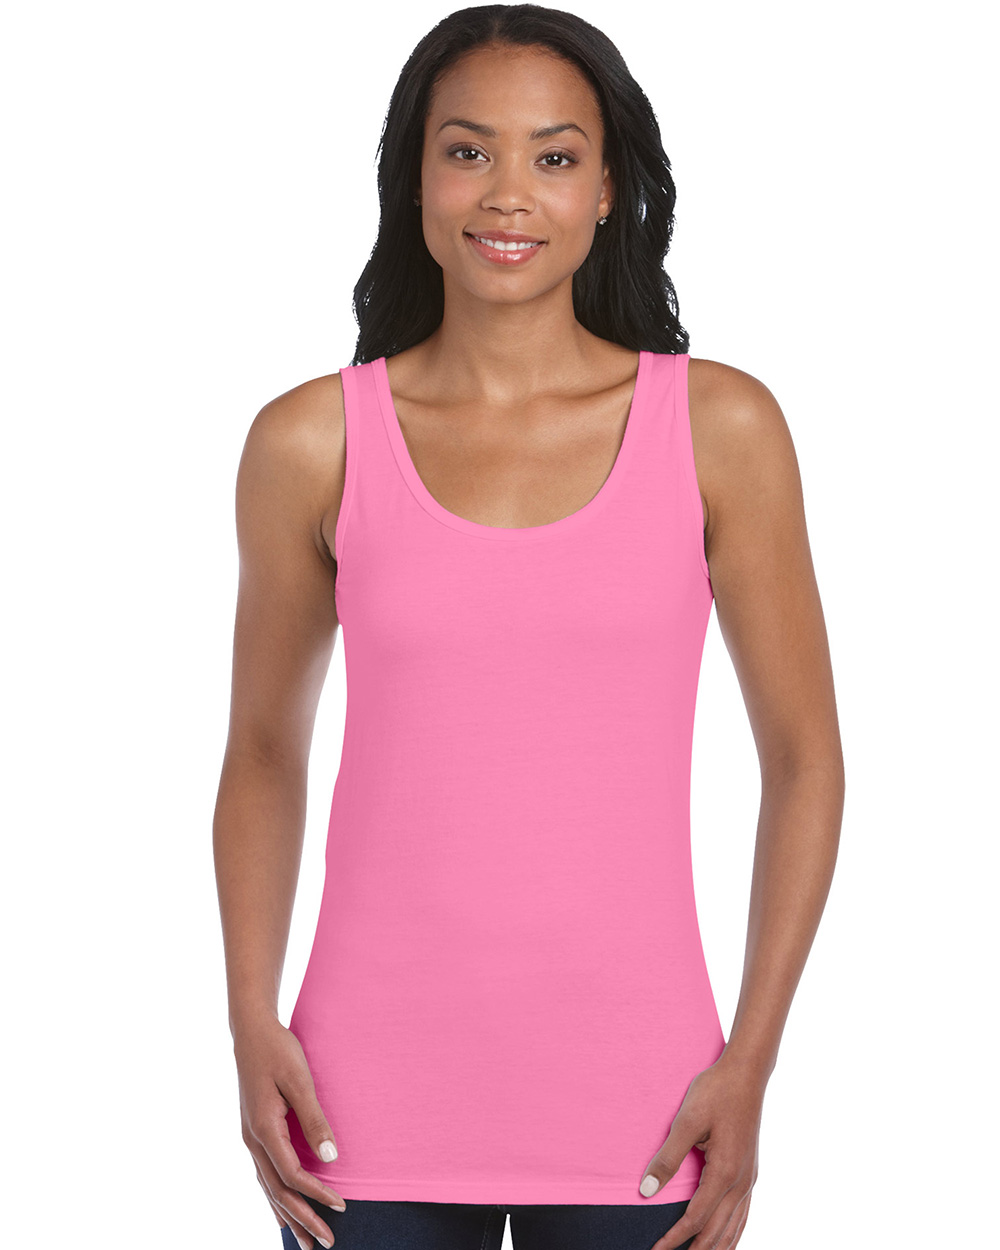 Gildan 64200L     Softstyle Junior Fit Ladies Tank Top    4.5 oz. 100% Cotton